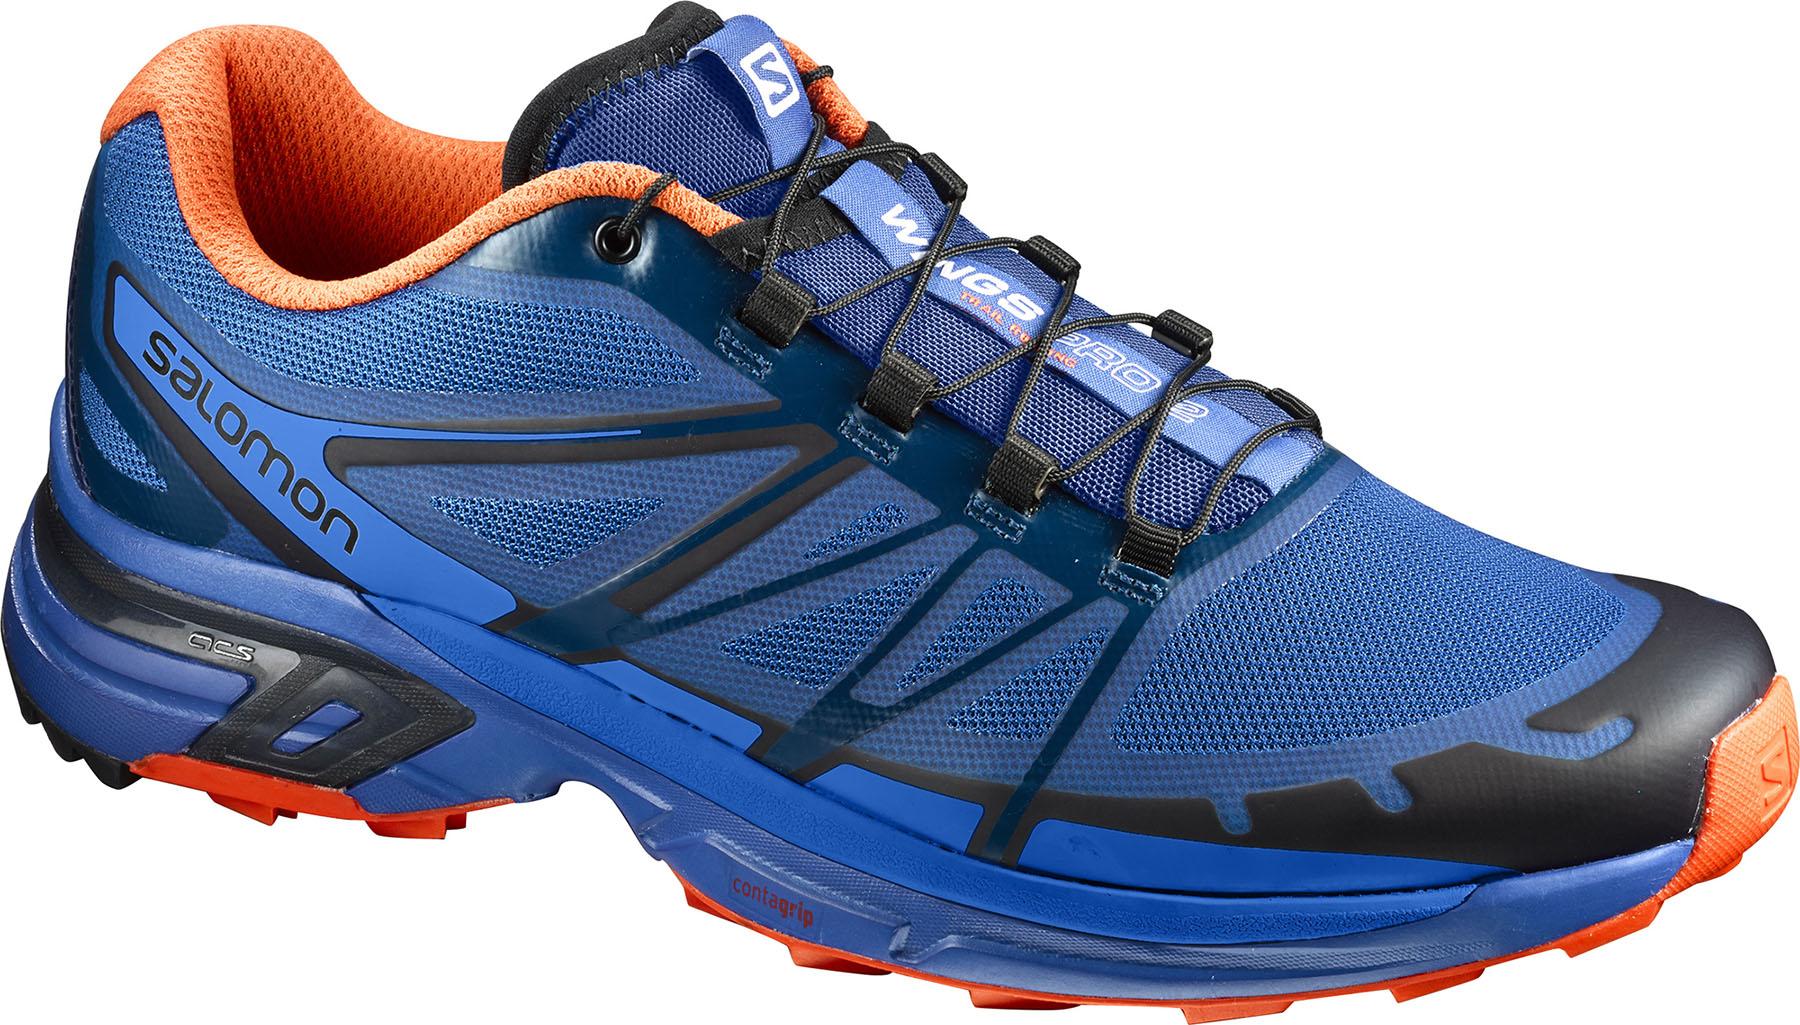 Herren Wings Blau Pro 2 Trail Zqqtgyx Laufschuh Salomon 392643 Uqq0axwC a628d020d2